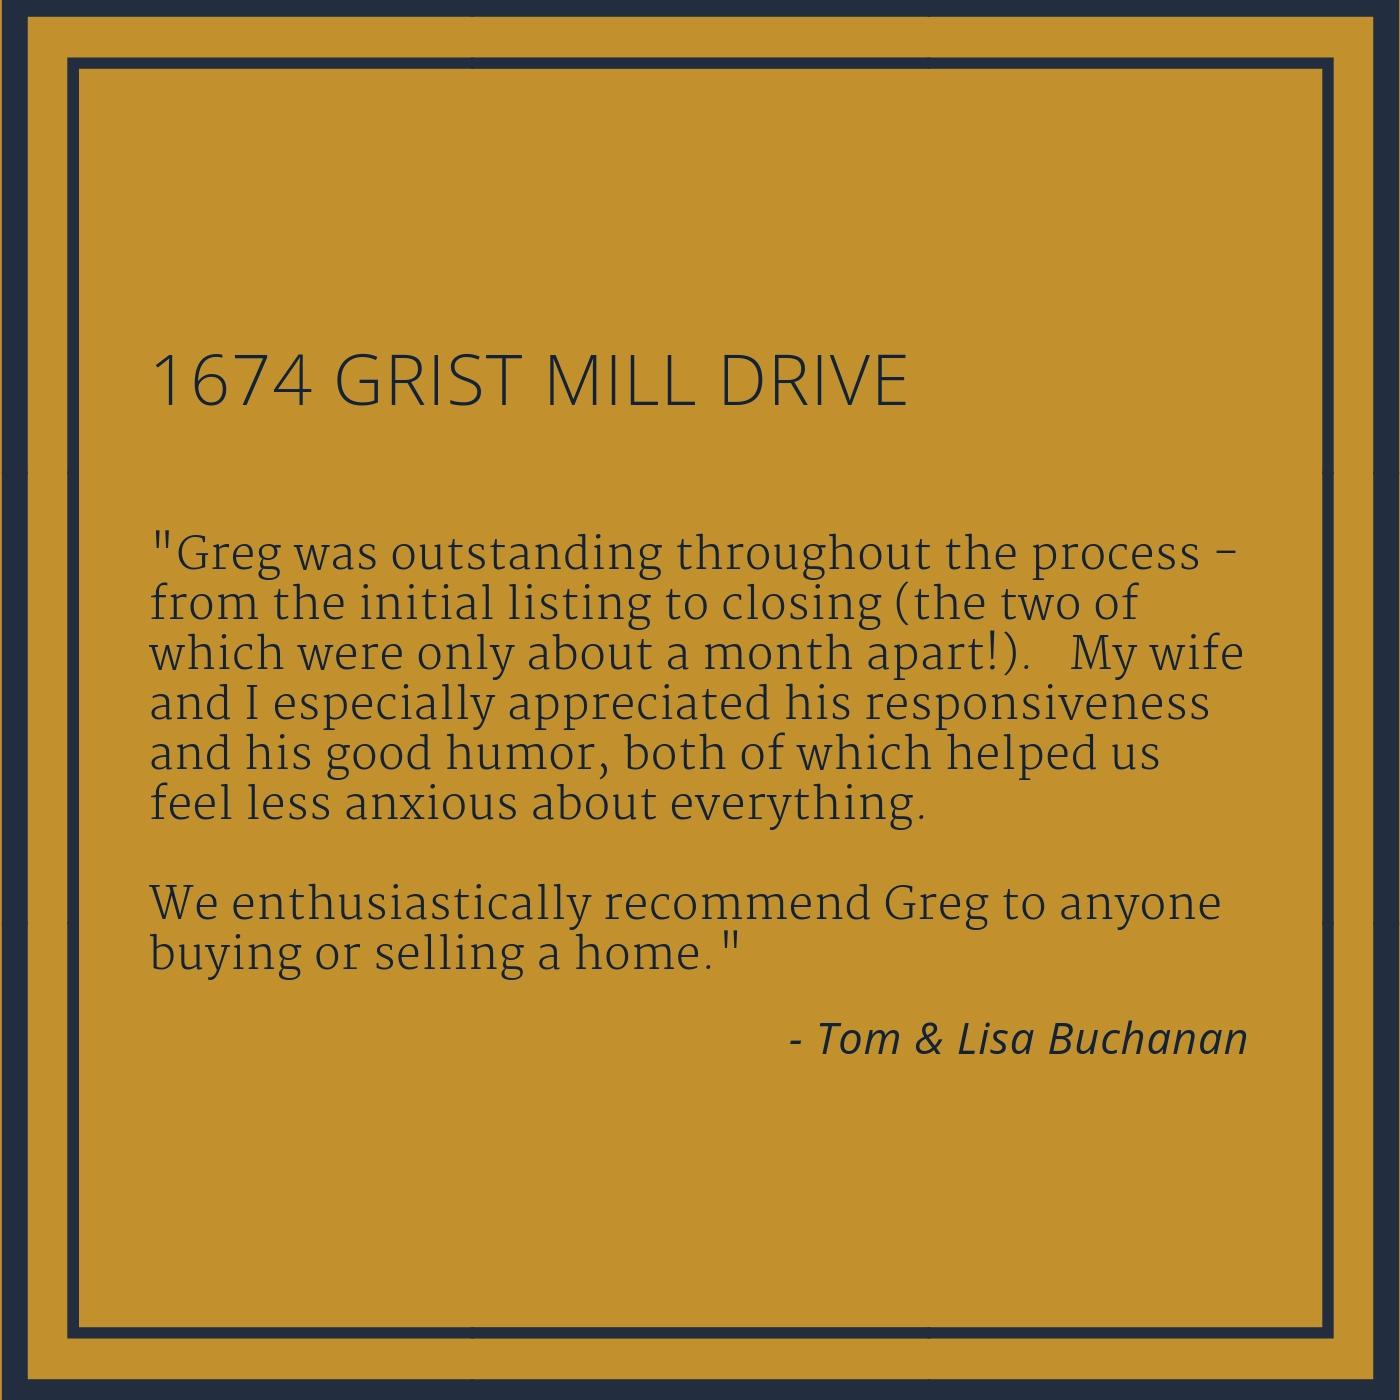 Testimonial Box - Tom & Lisa Buchanan.jpg